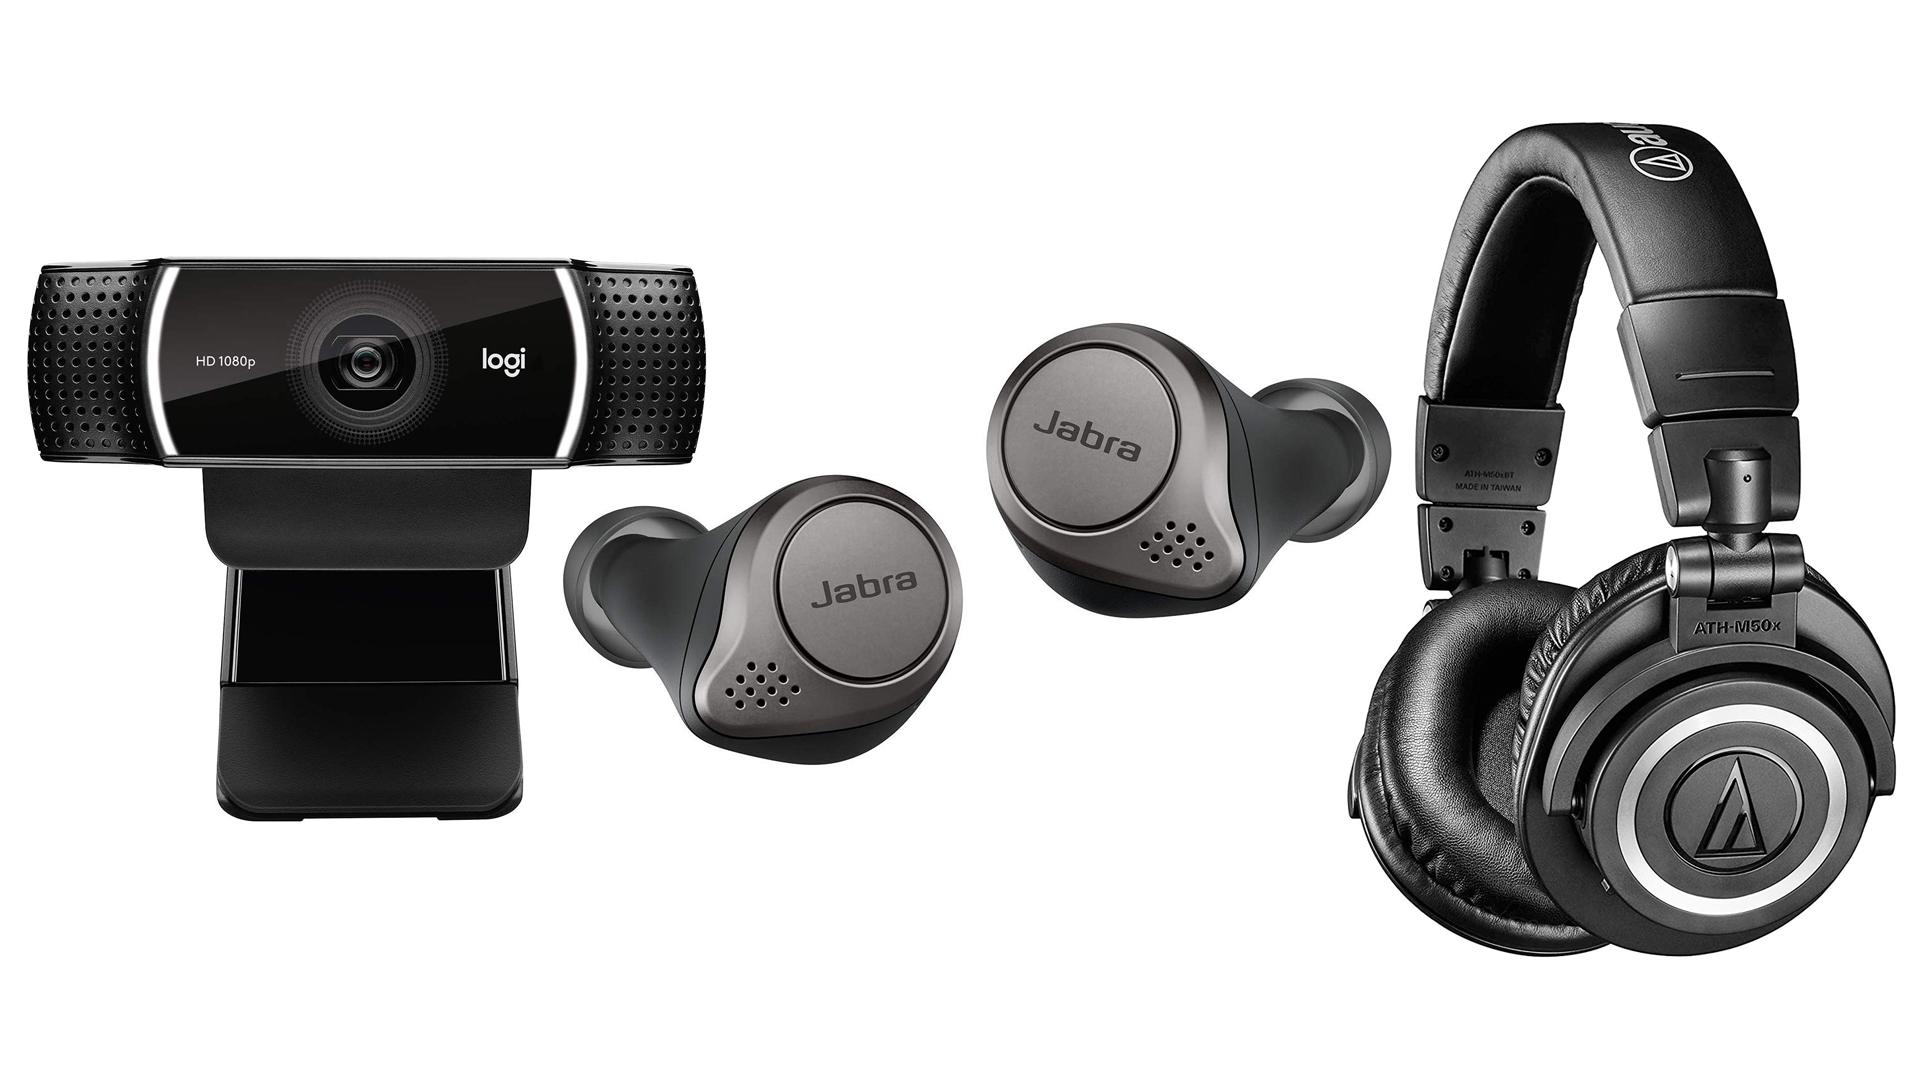 A photo of the Logitech webcam, Jabra Elite 75t earbuds, and the Audio Technica wireless headphones